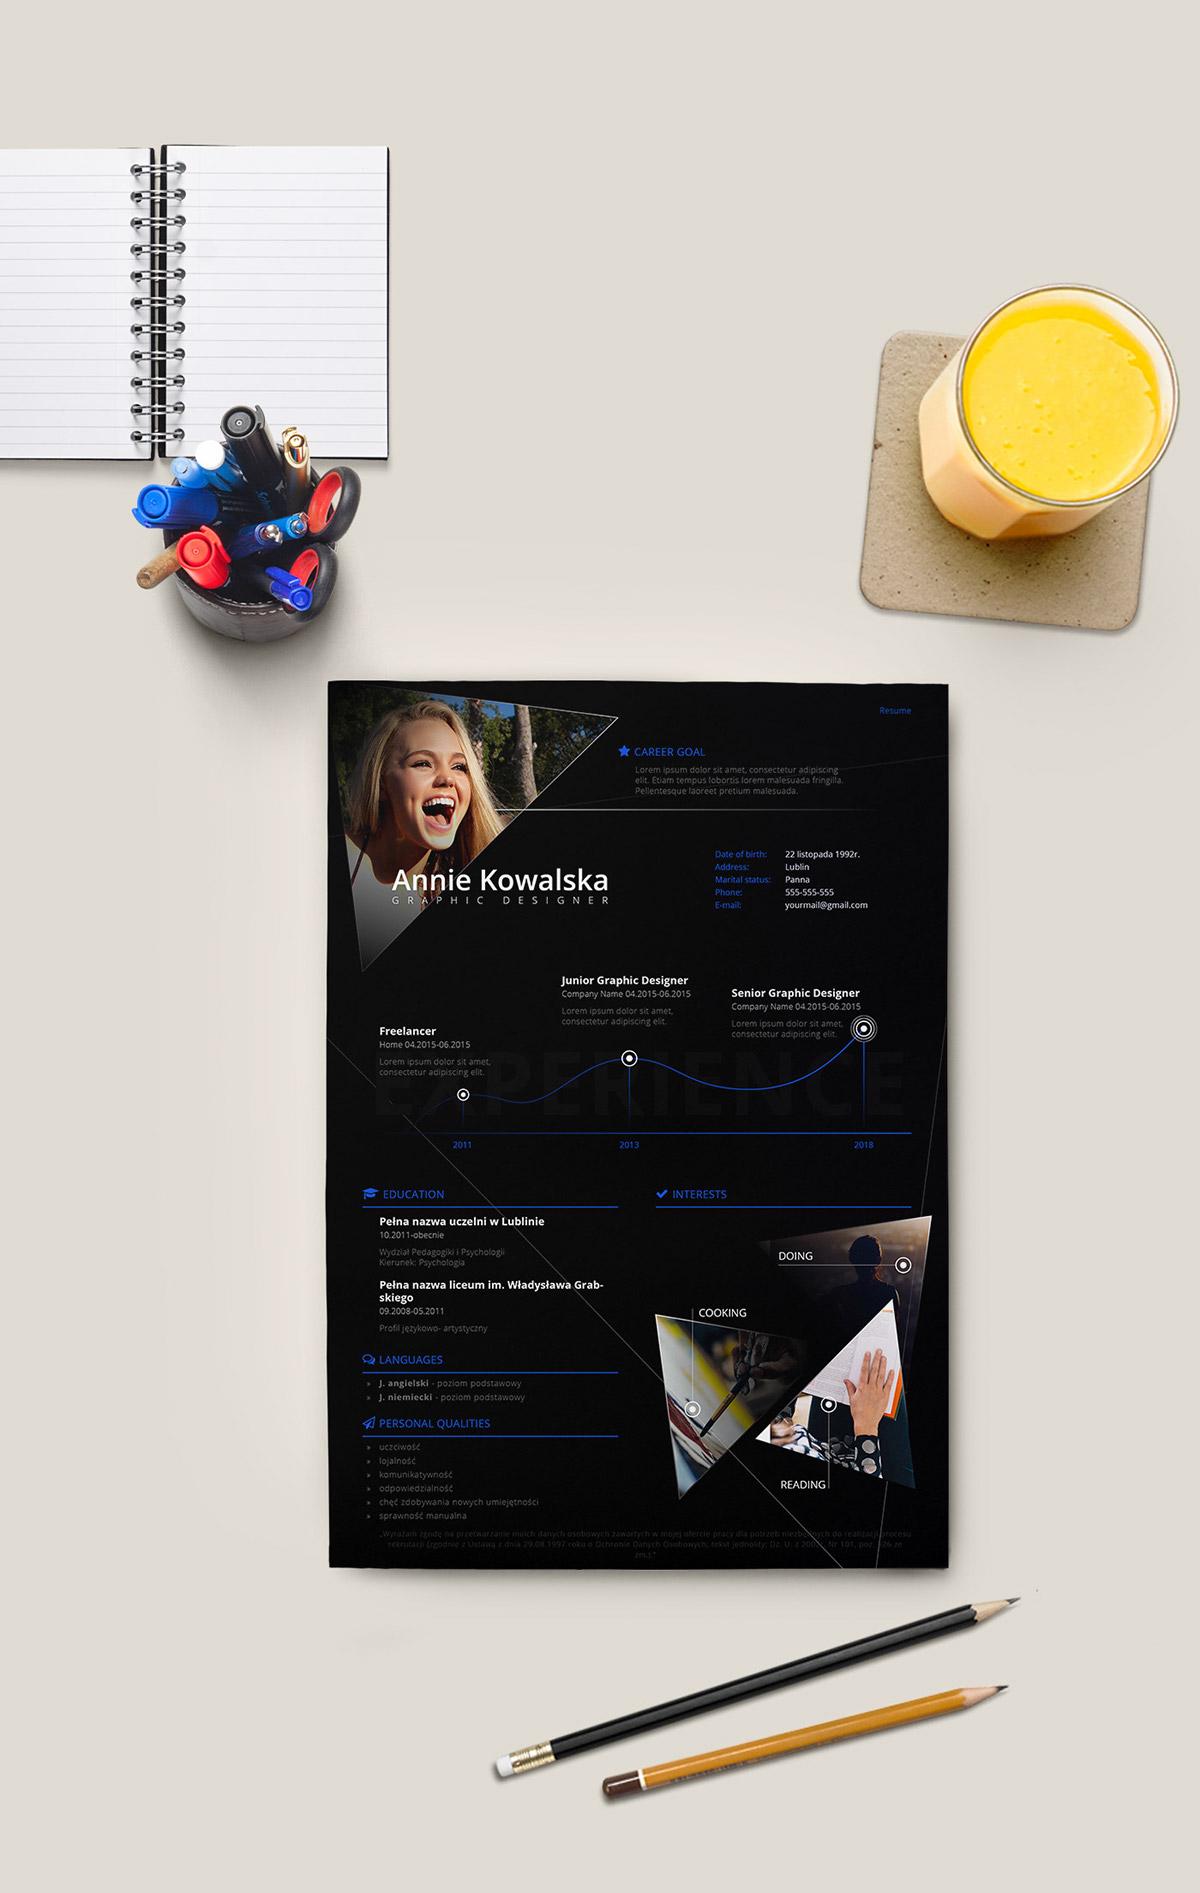 Free Minimalistic Resume/CV - InDesign